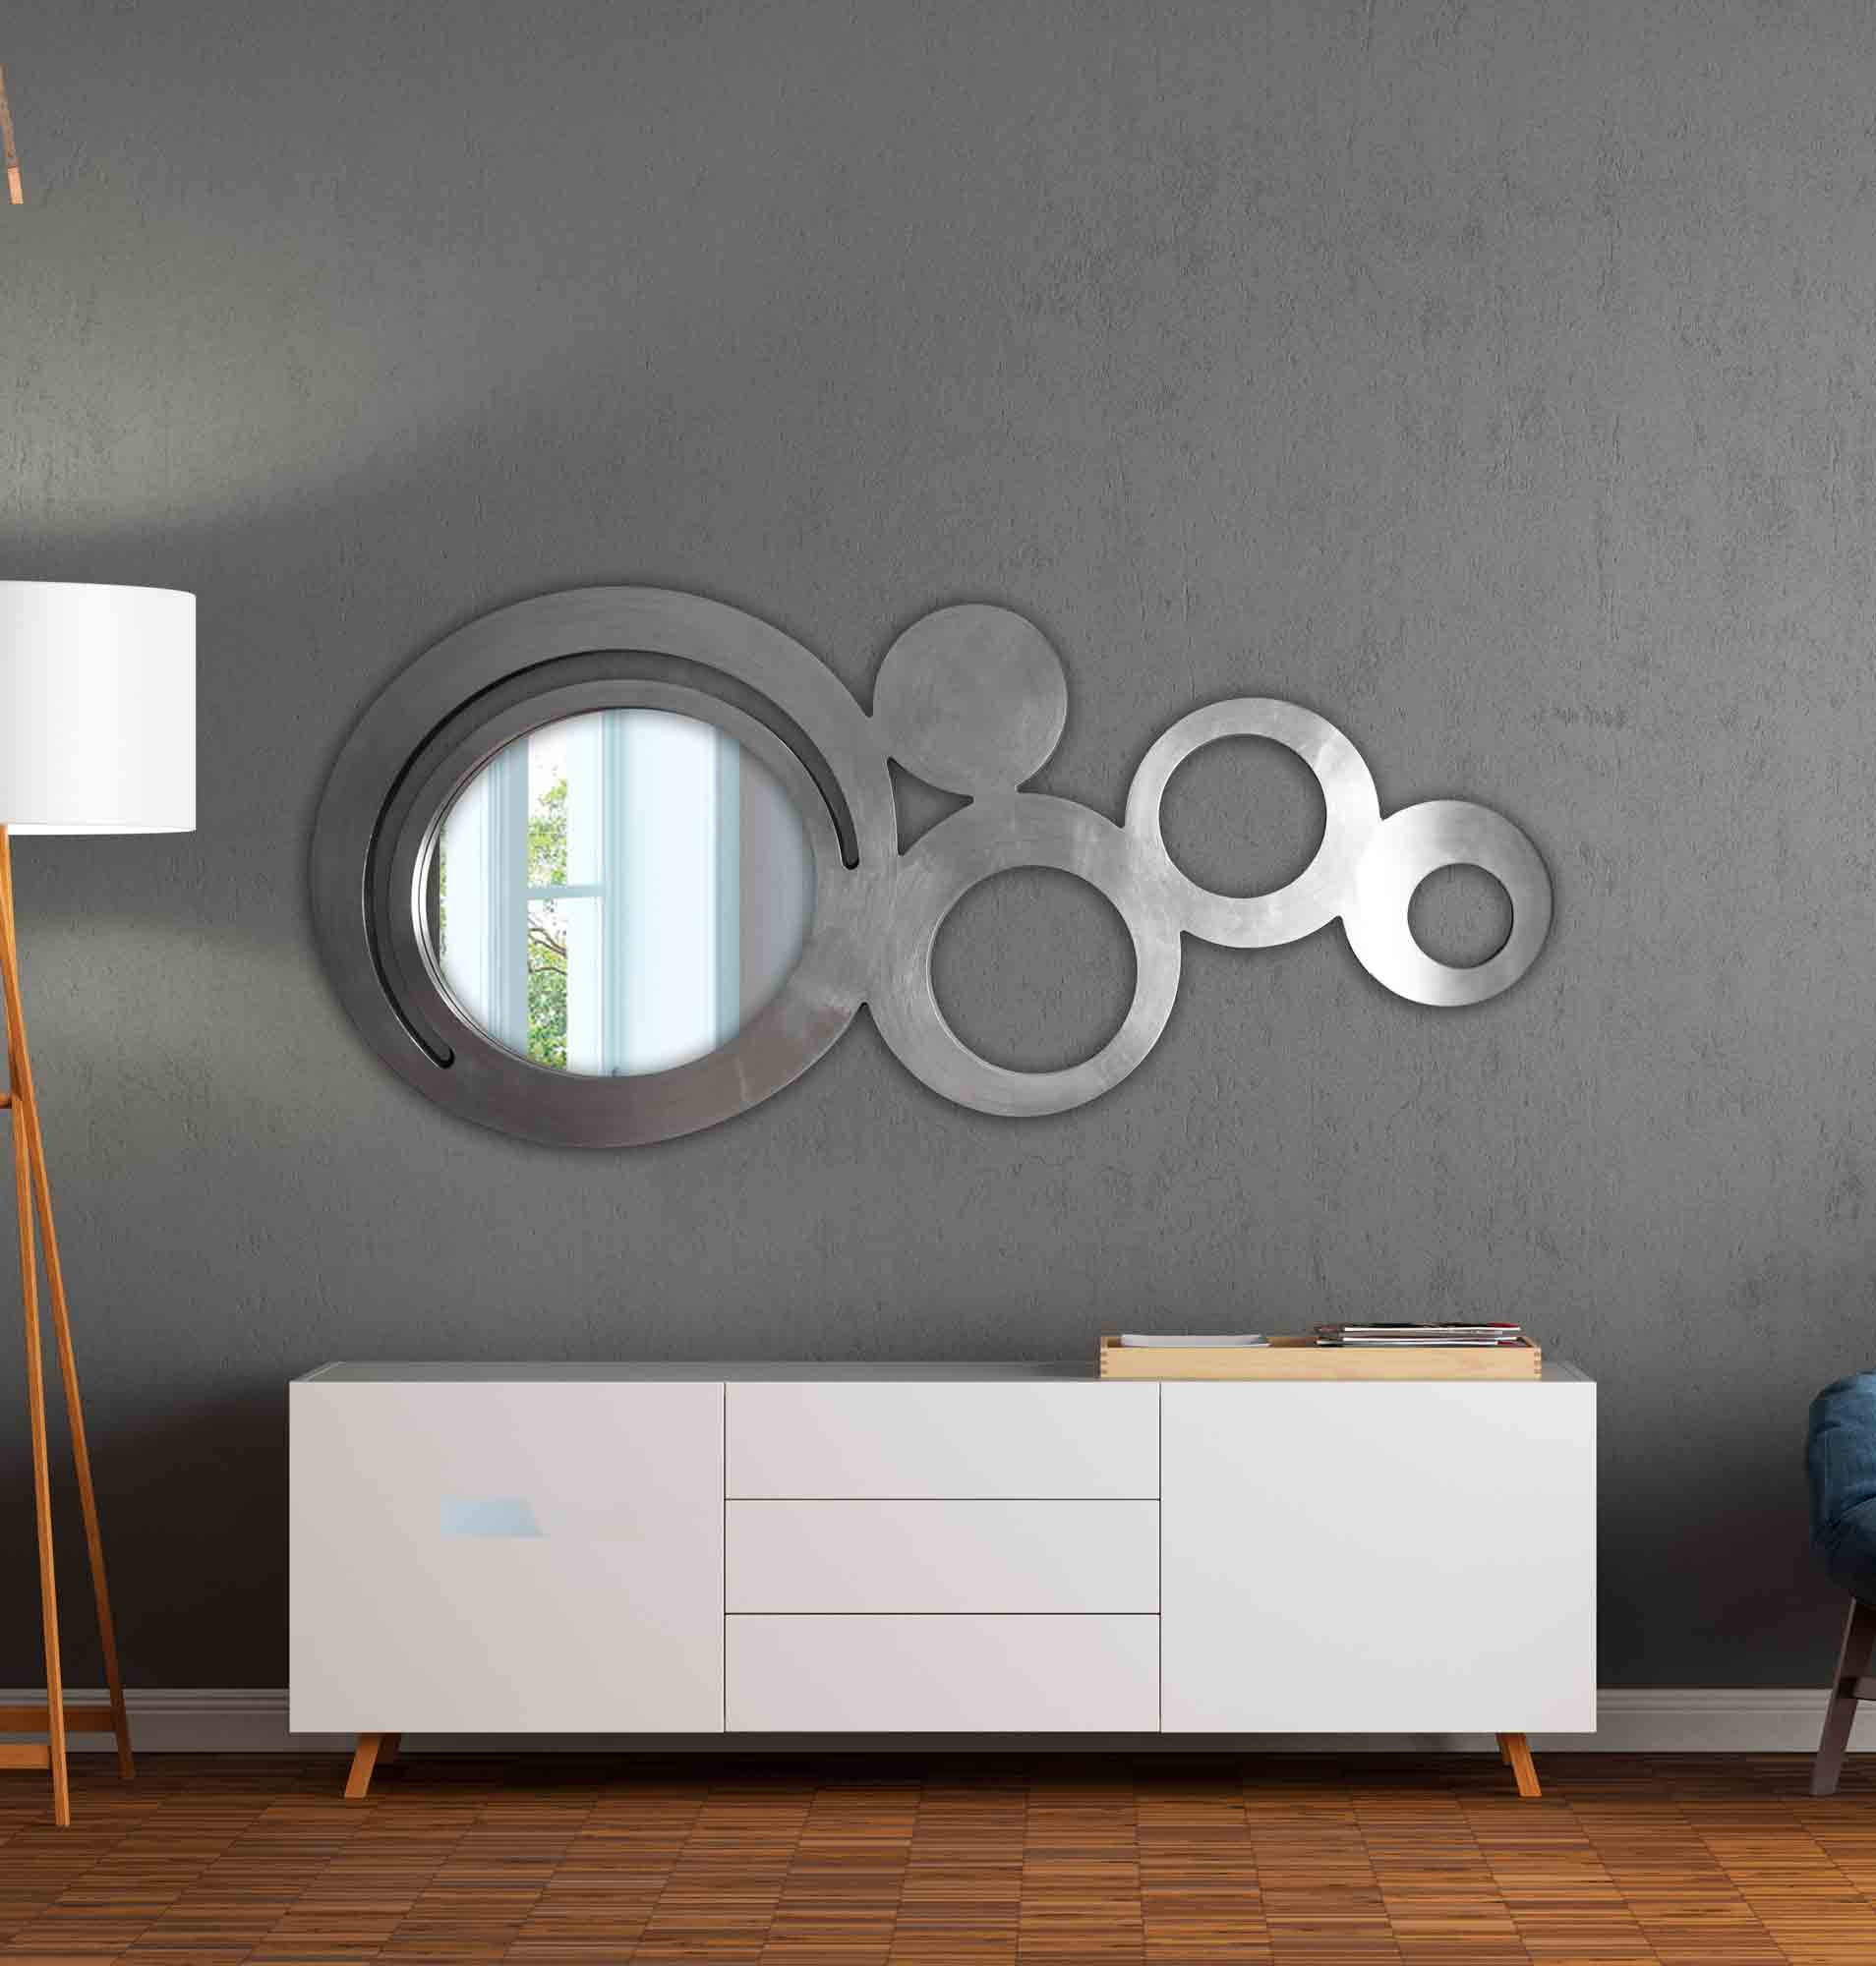 Espejo recibidor redondela art culo nico que podr s for Oferta espejos pared